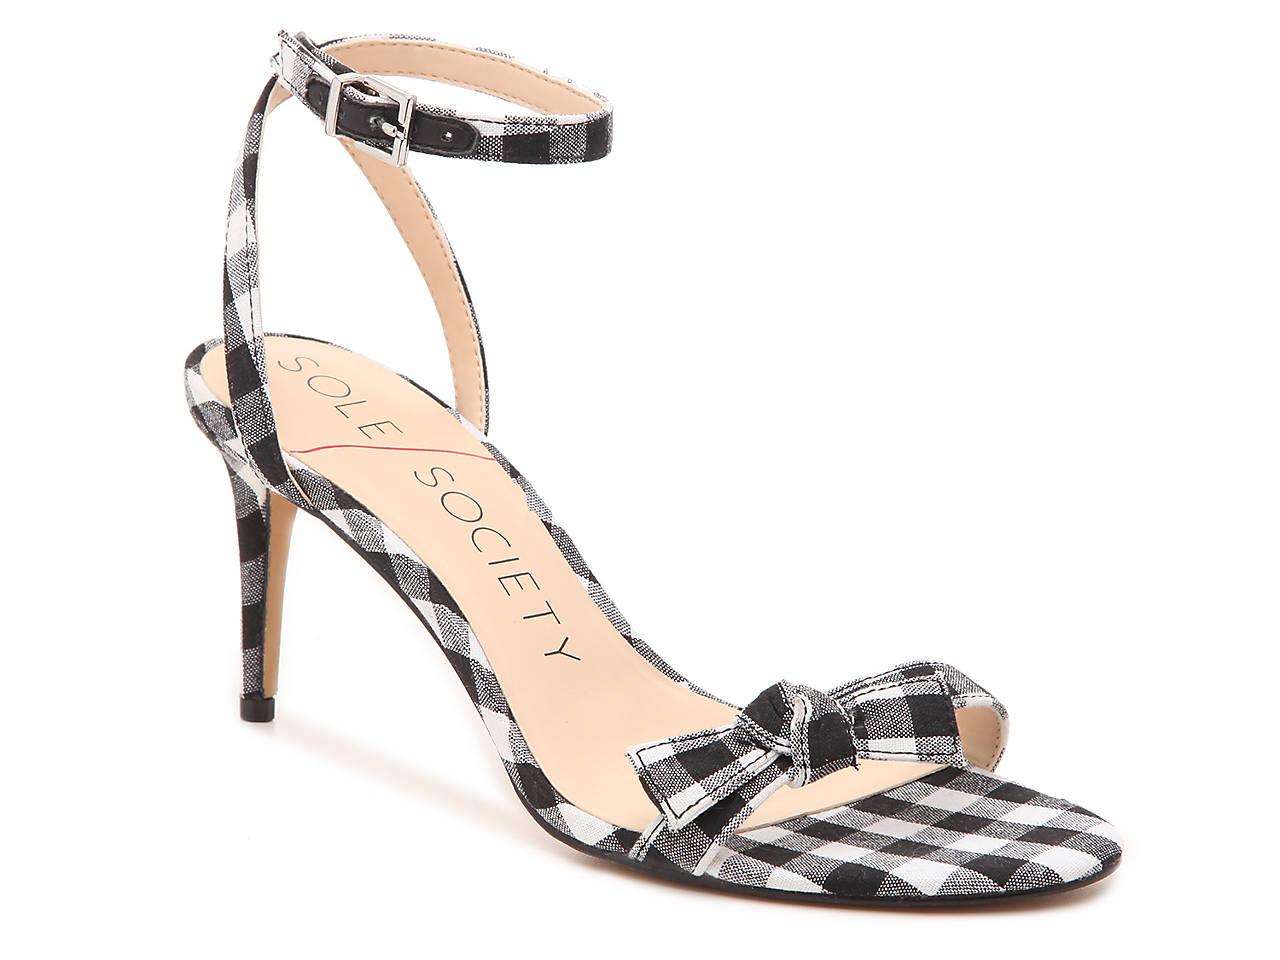 ffb624a00db Avrilie Sandal